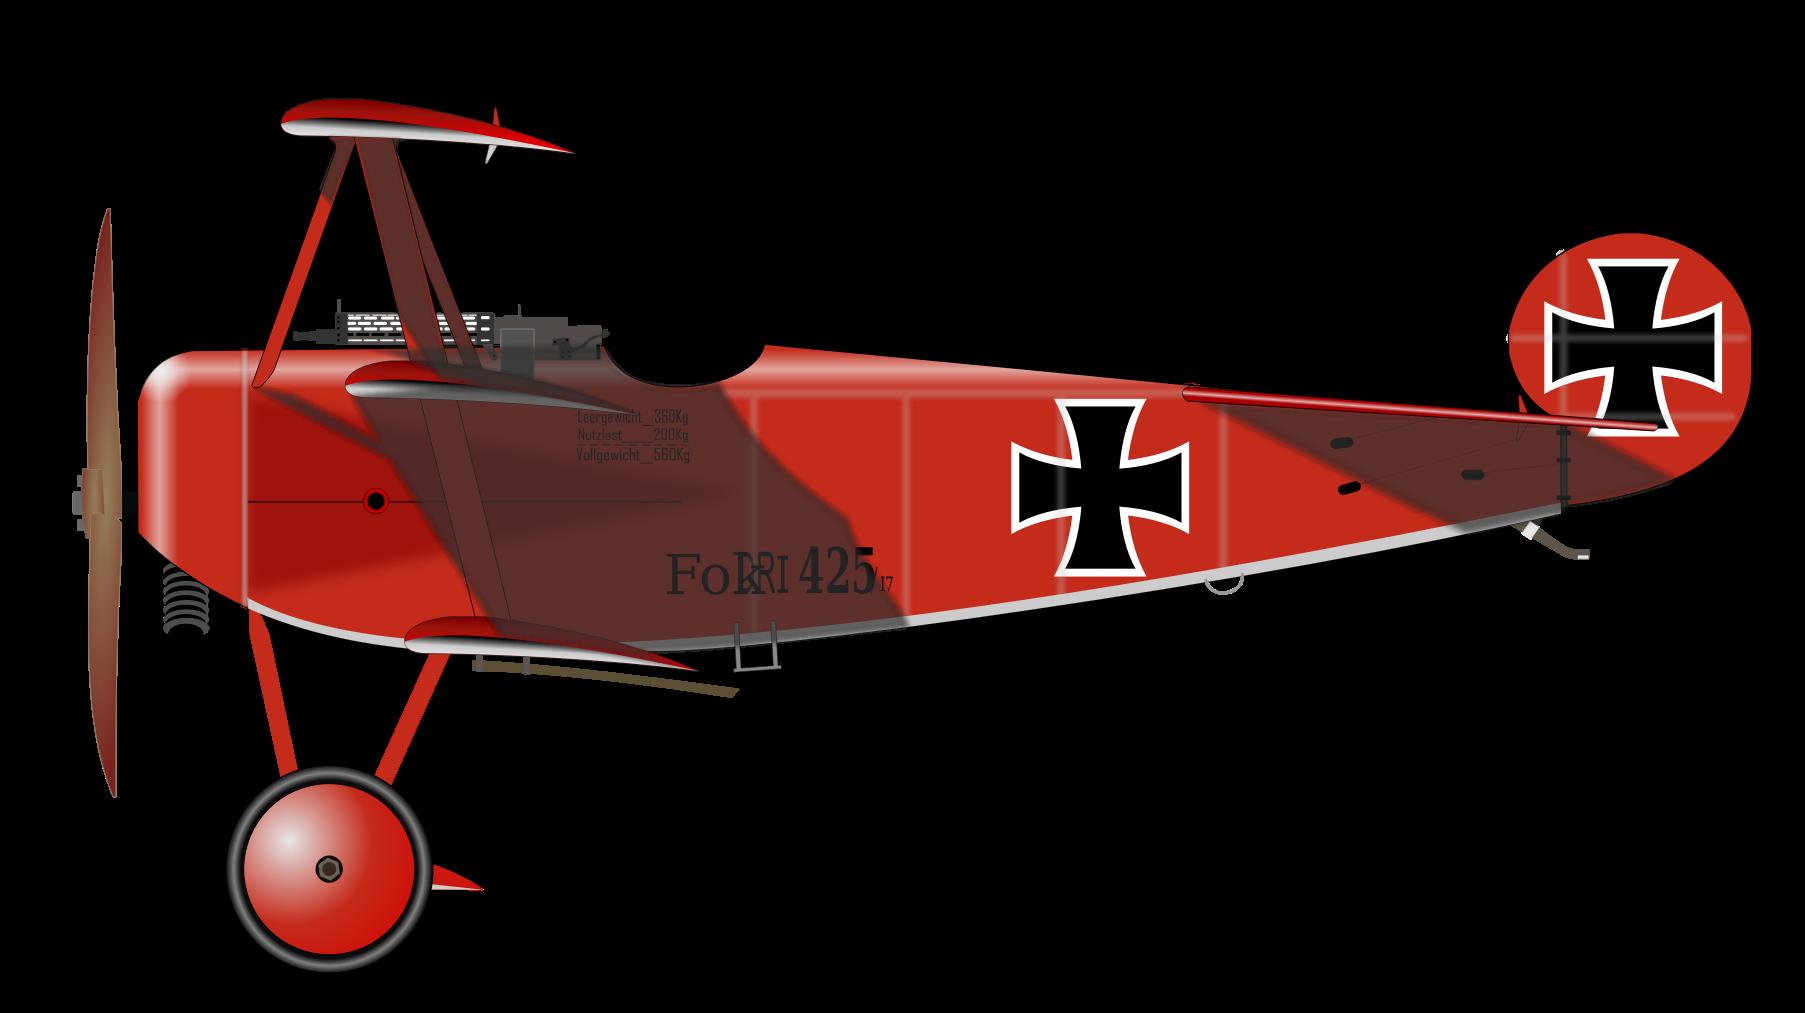 1805x1013 Aircraft Clipart Military Aircraft